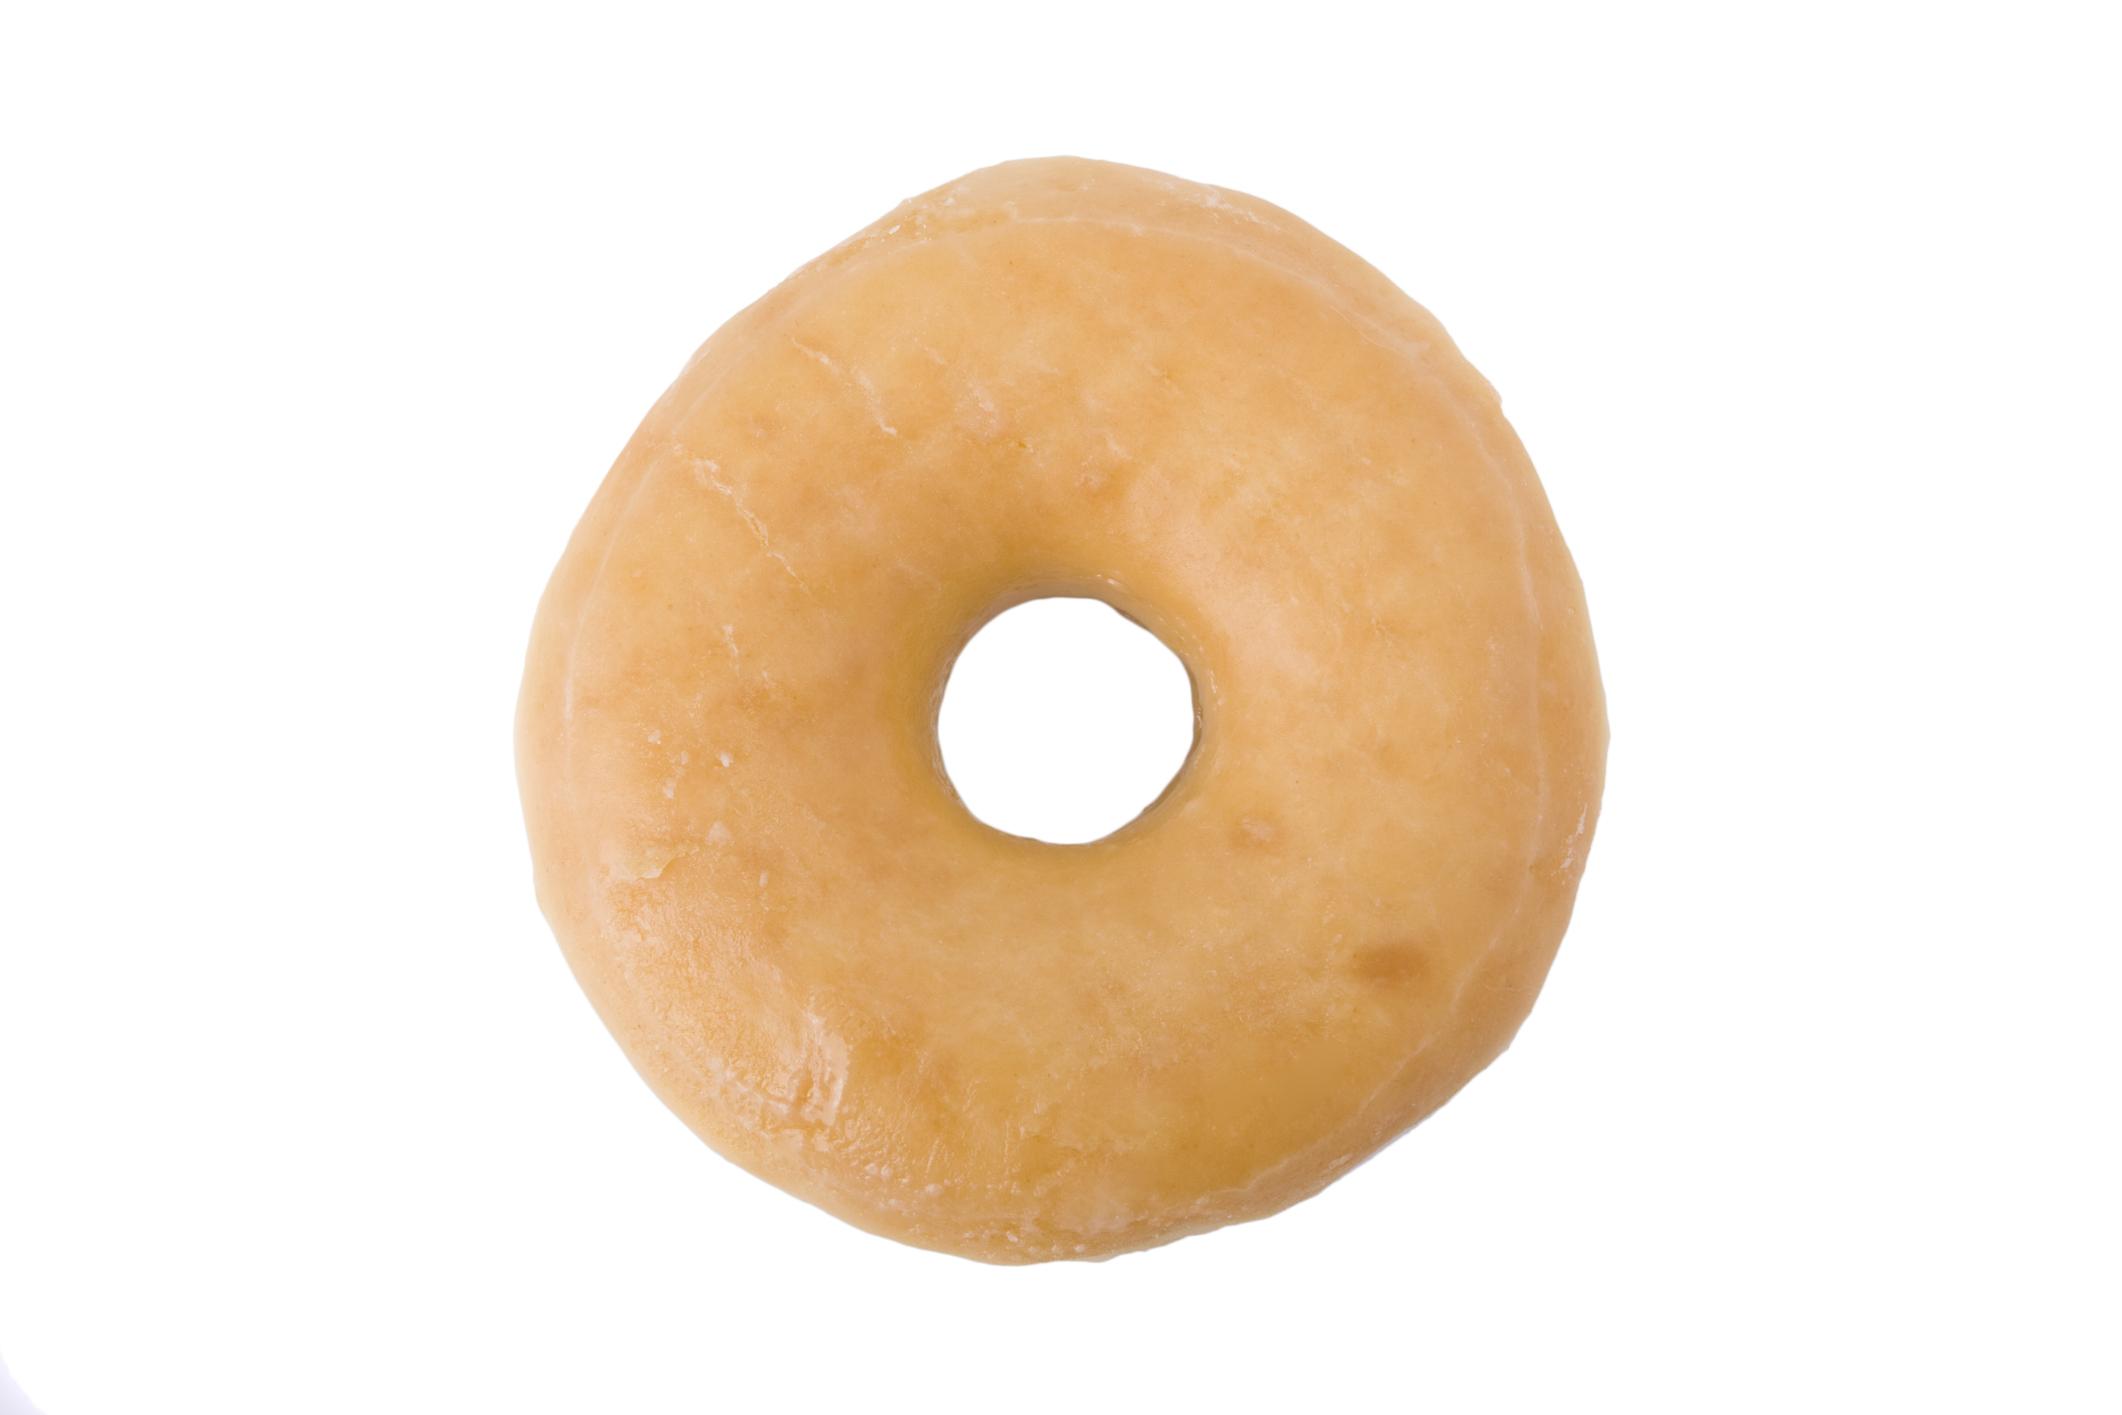 Shipley blueberry cake donut calories